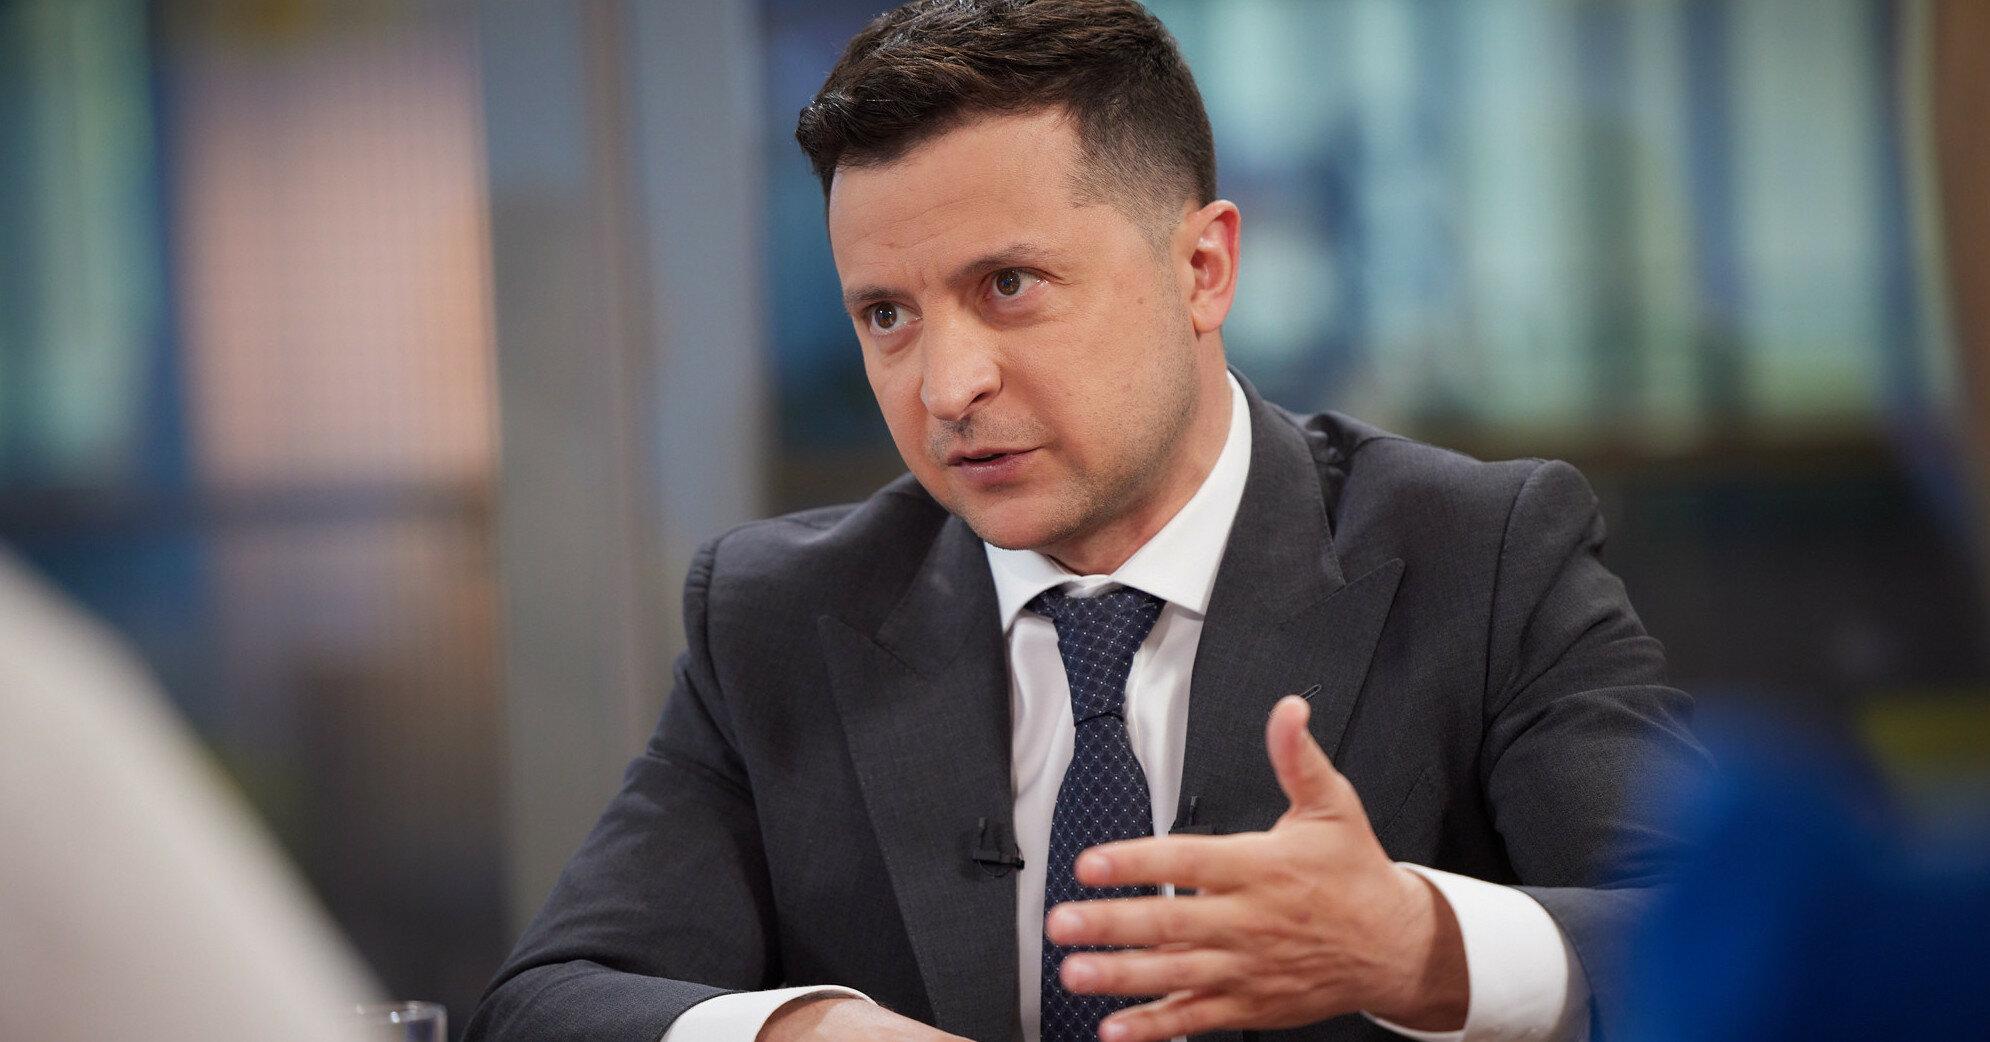 Зеленский пригрозил олигархам референдумом